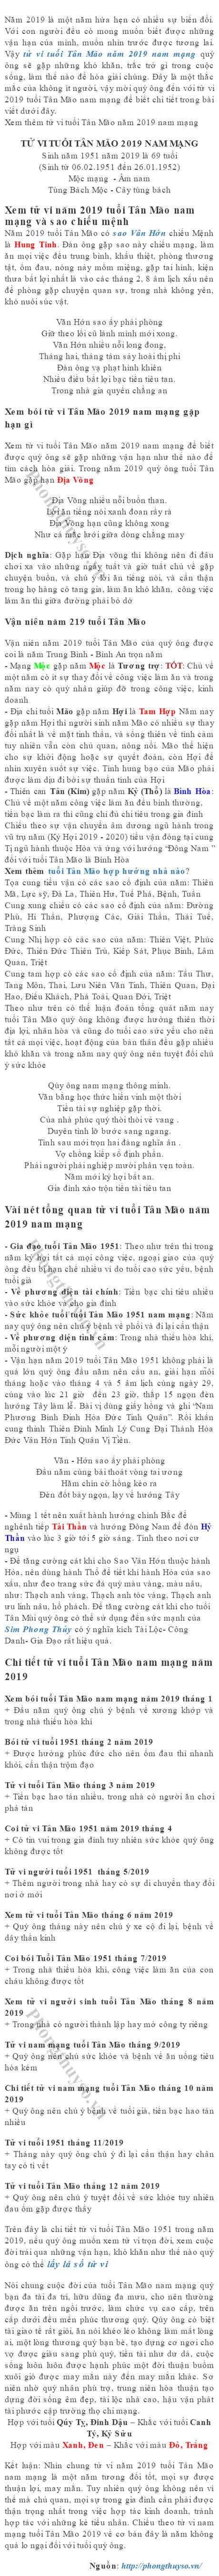 tu-vi-tuoi-tan-mao-nam-2019-nam-mang